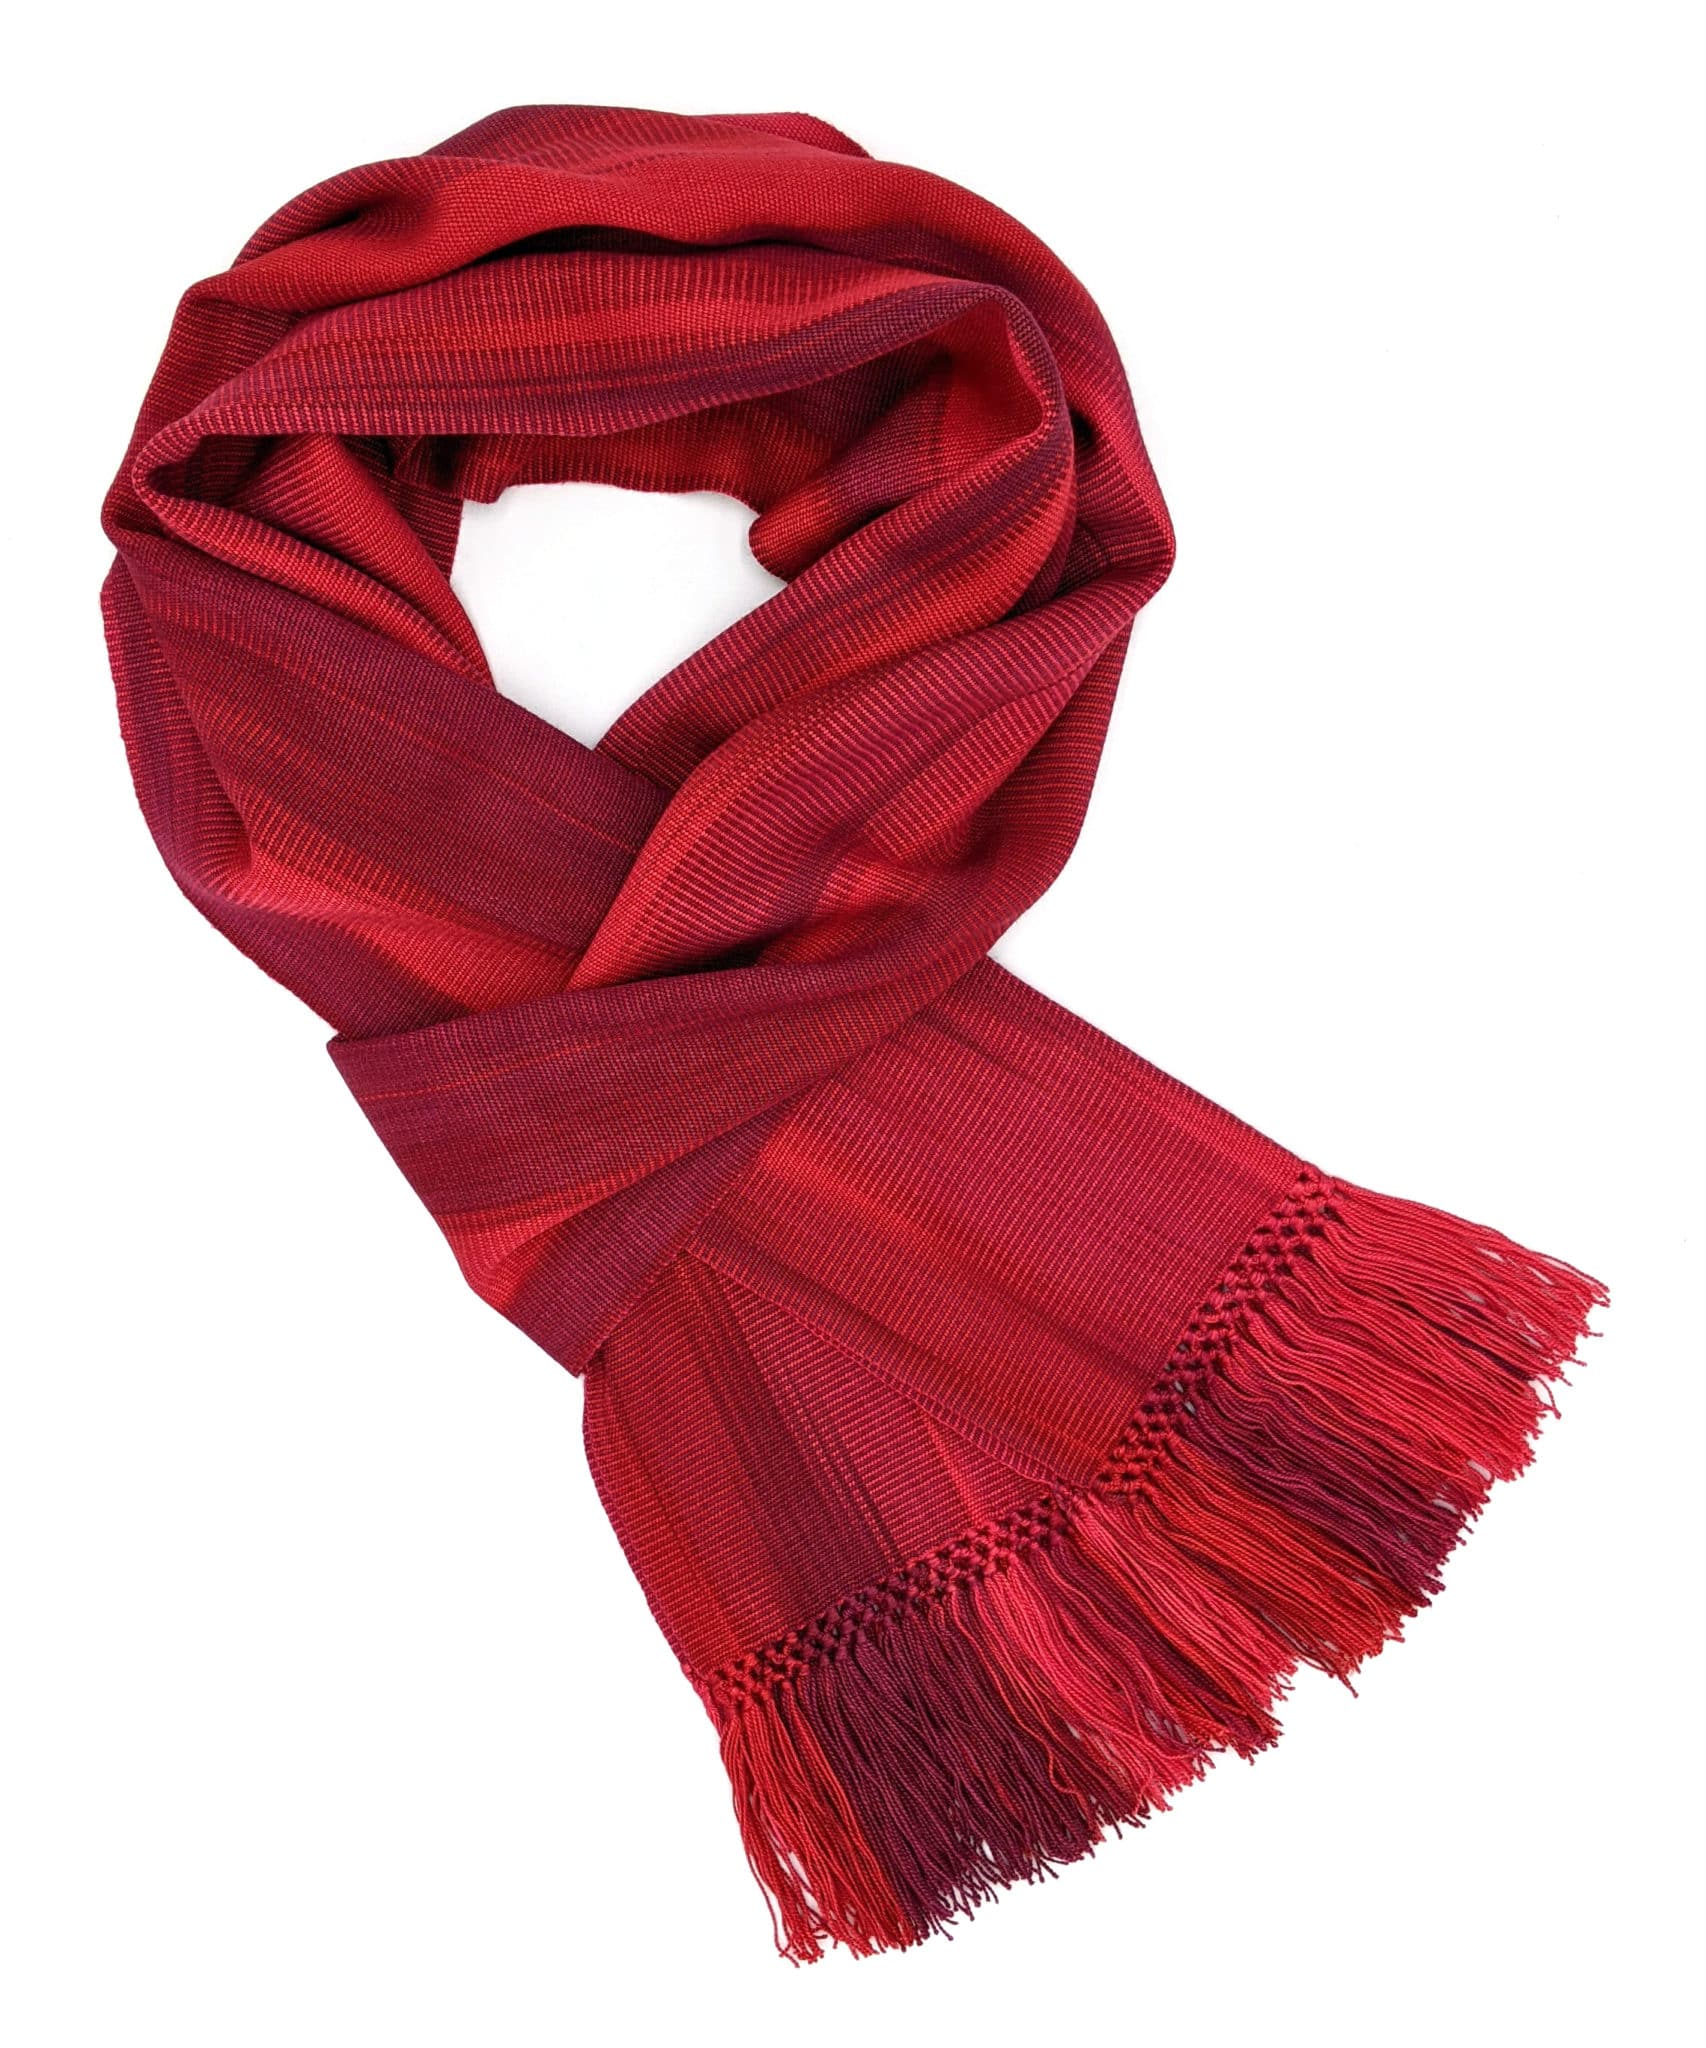 Reds (Bright!) - Lightweight Bamboo Handwoven Scarf 8 x 68